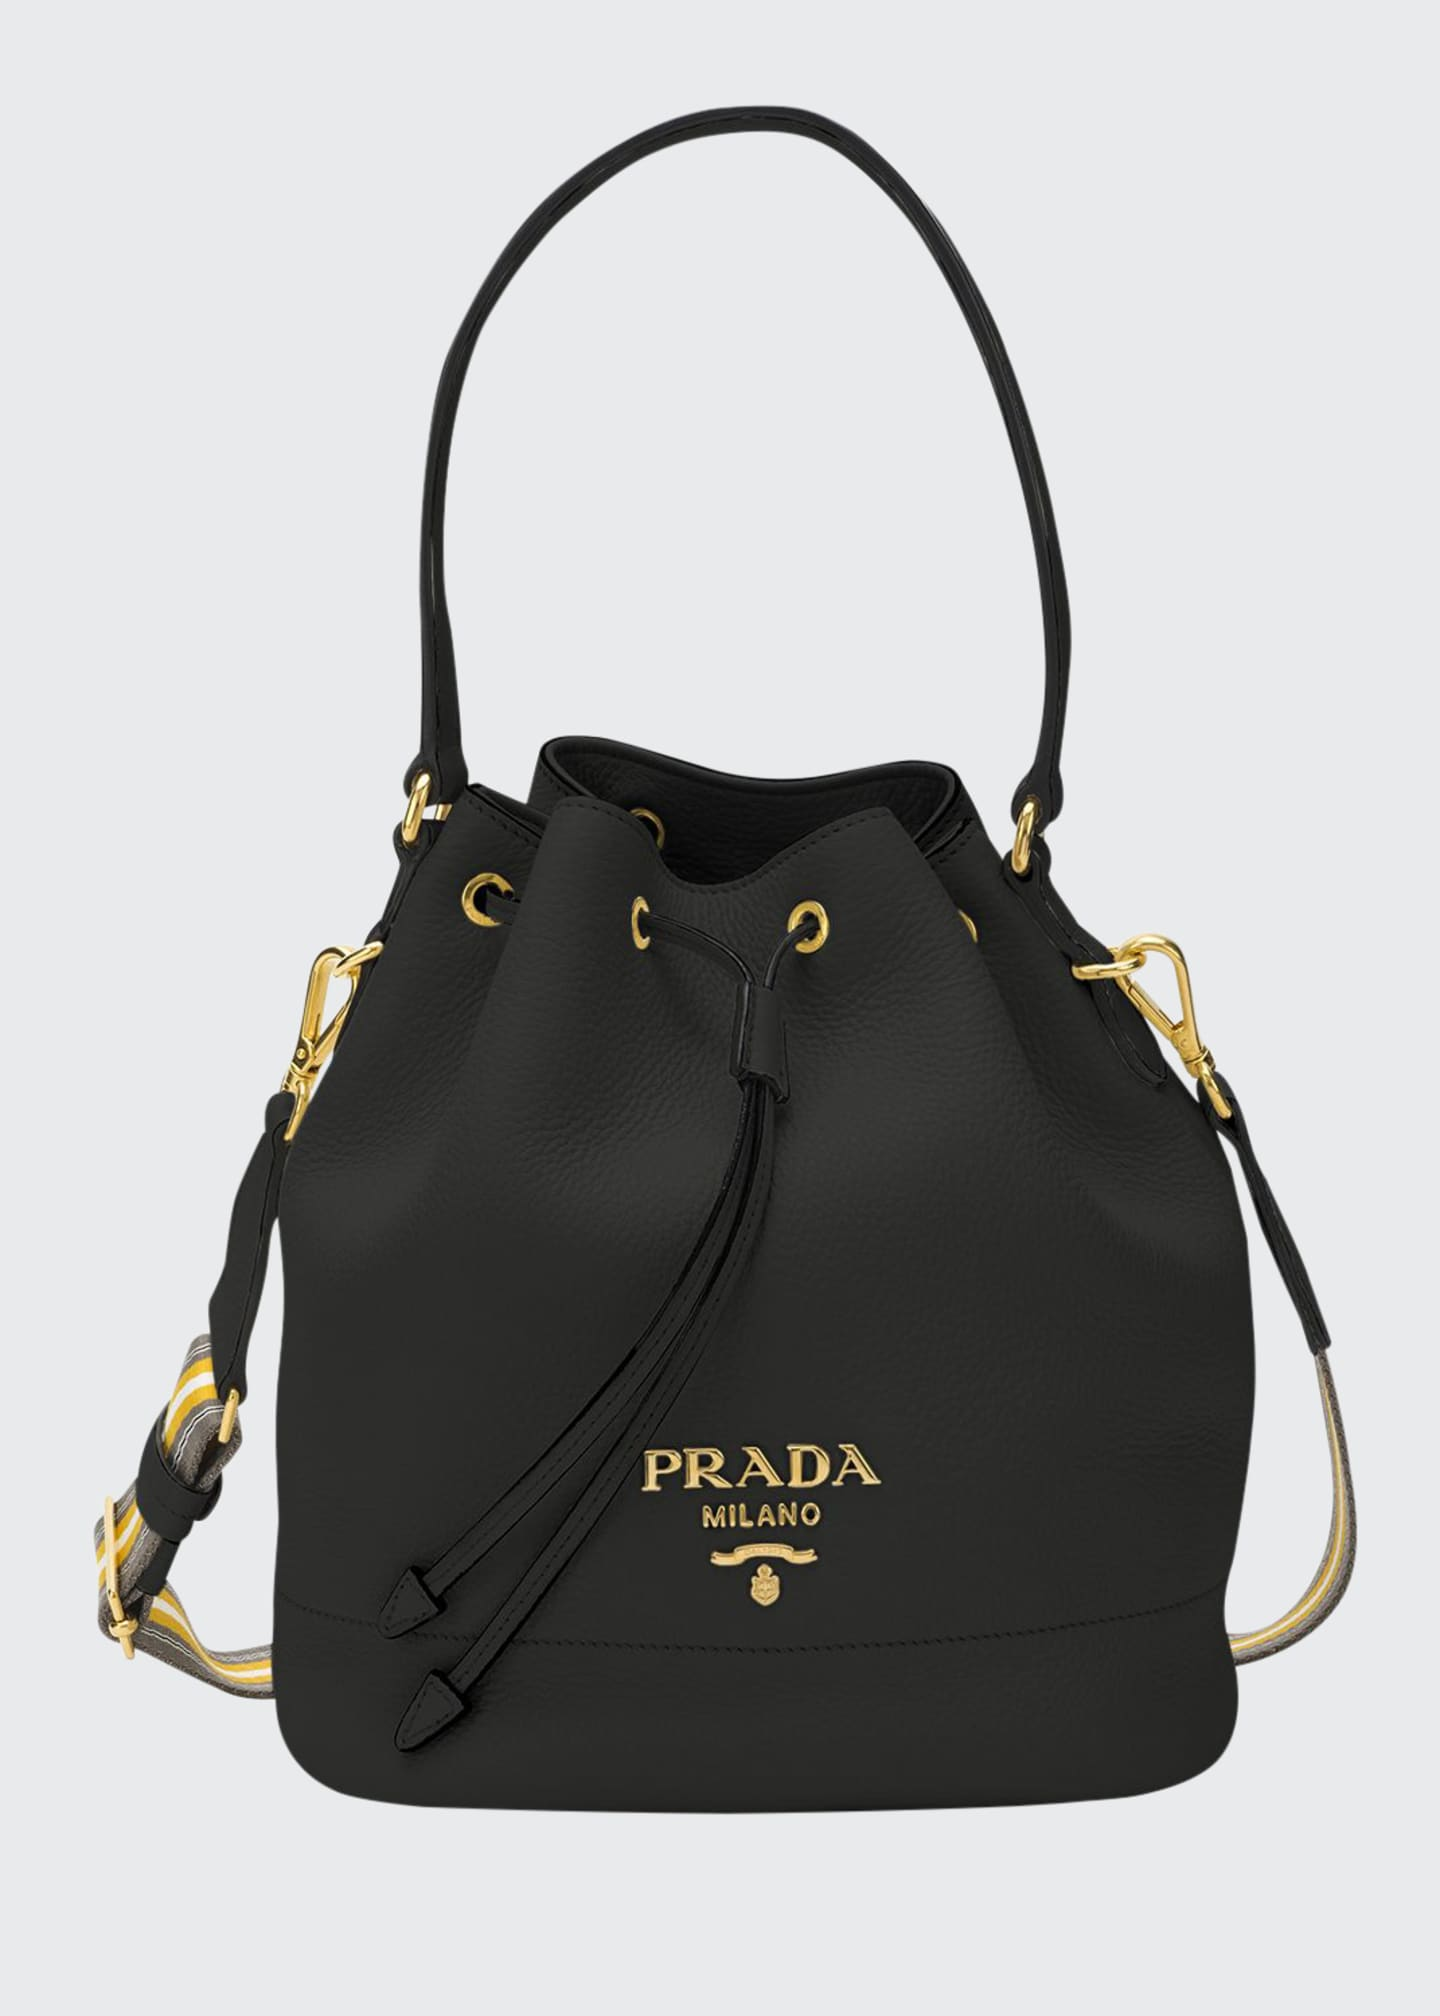 Prada Daino Bucket Bag